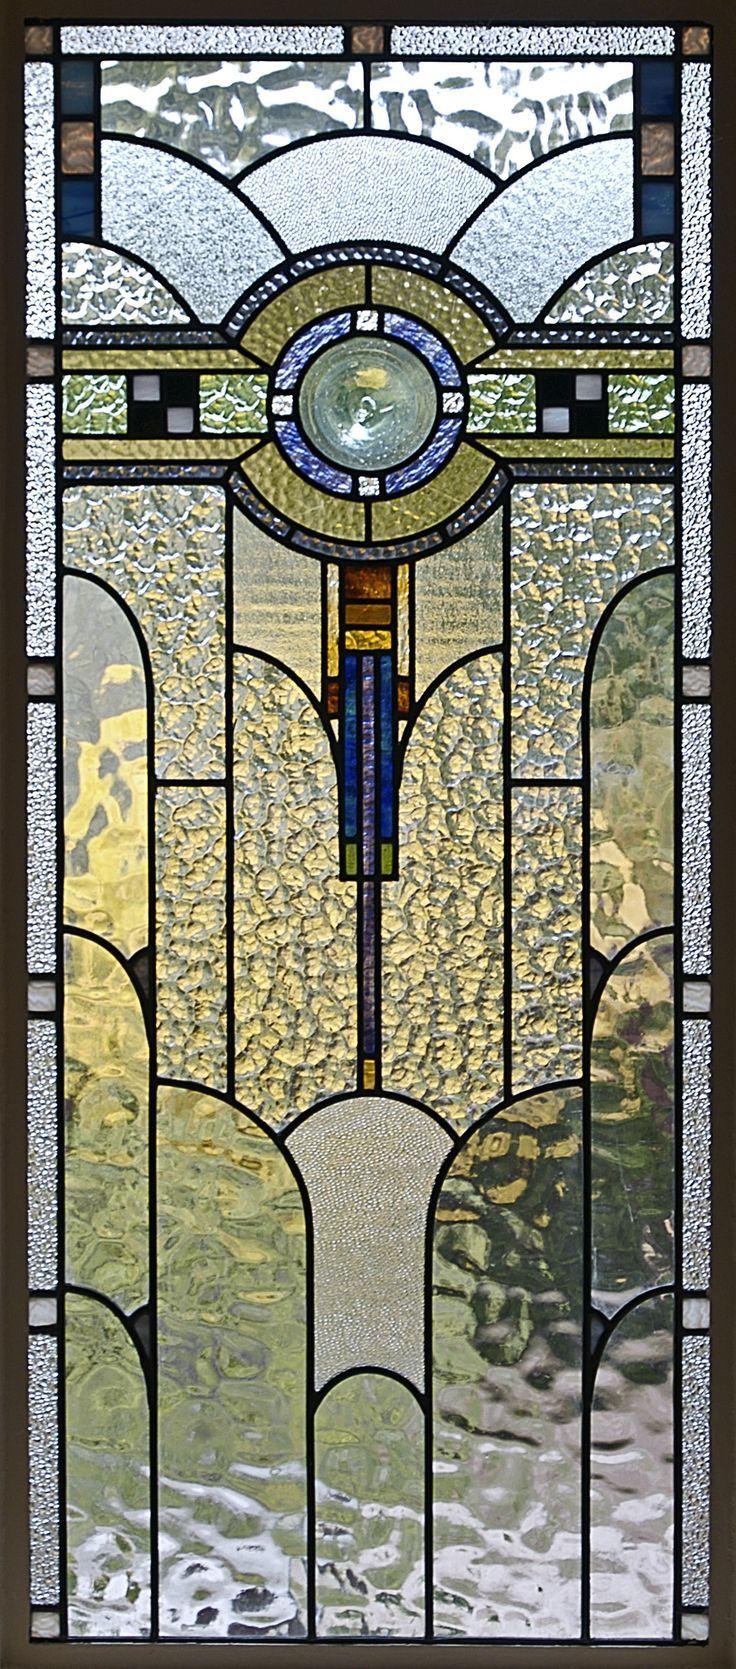 Art deco stained glass art deco pinterest art deco glass and art deco stained glass planetlyrics Gallery